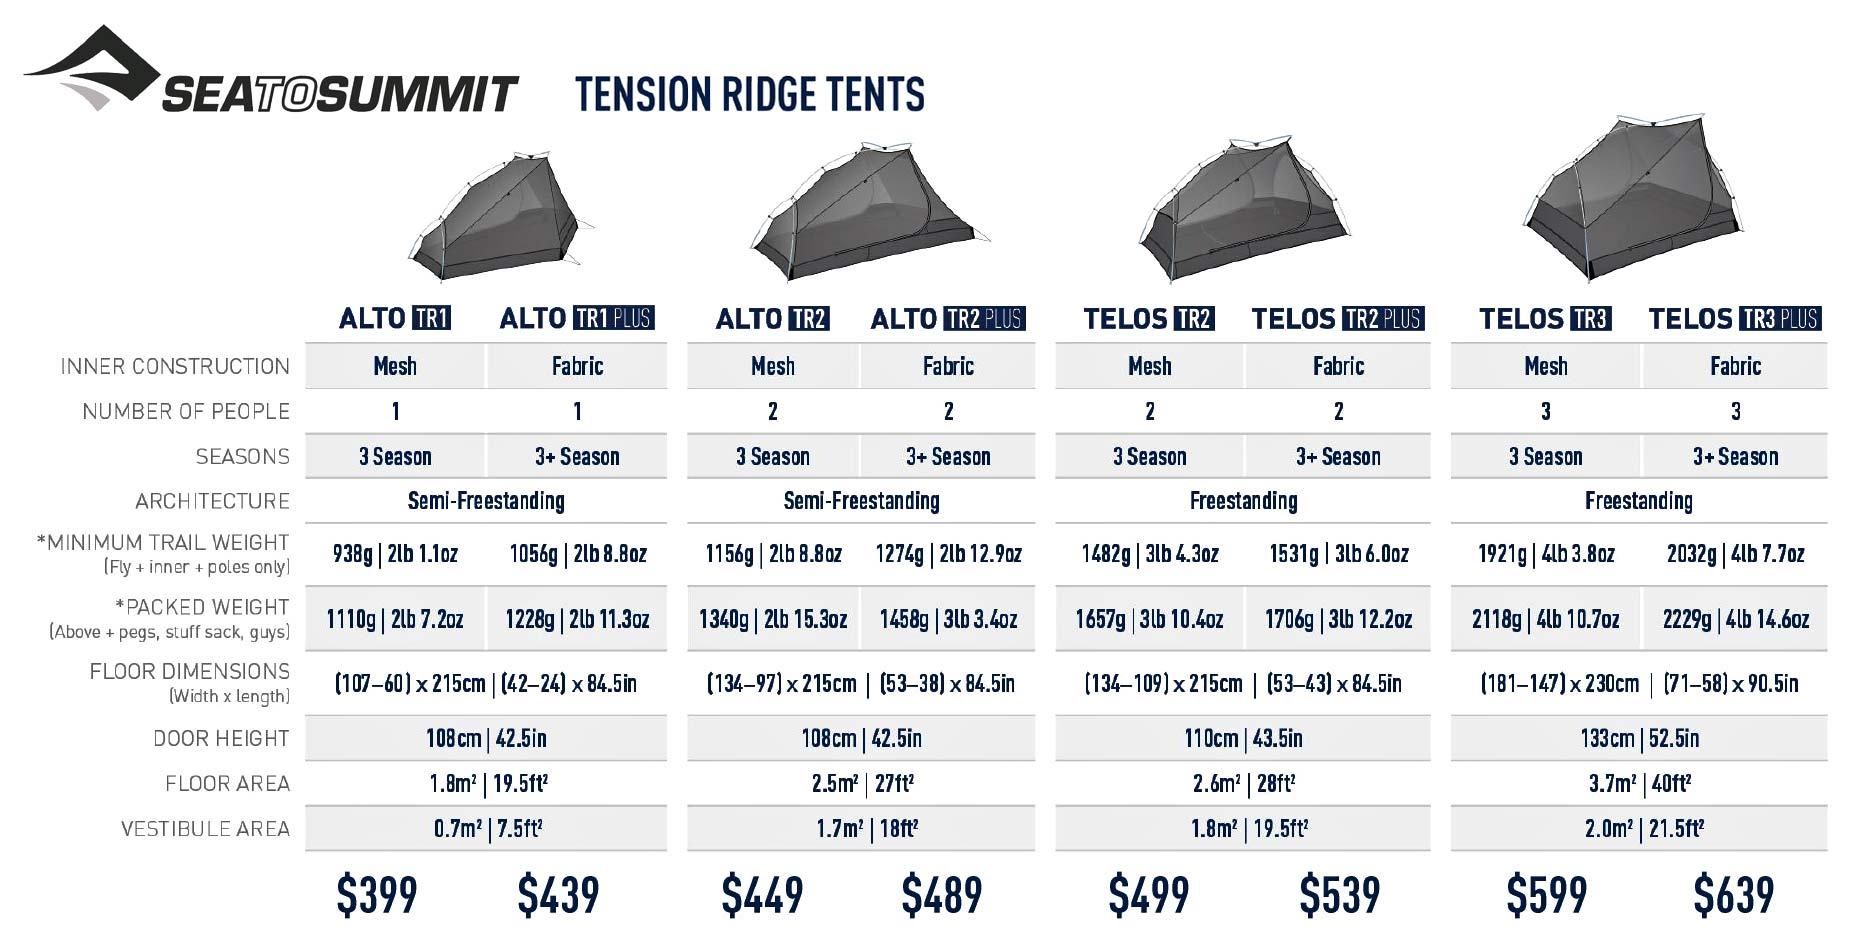 Sea to Summit Alto and Telos TR lightweight tents, Tension Ridge modular 3-season ultralight bikepacking tent Tech details:pricing, sizing & options